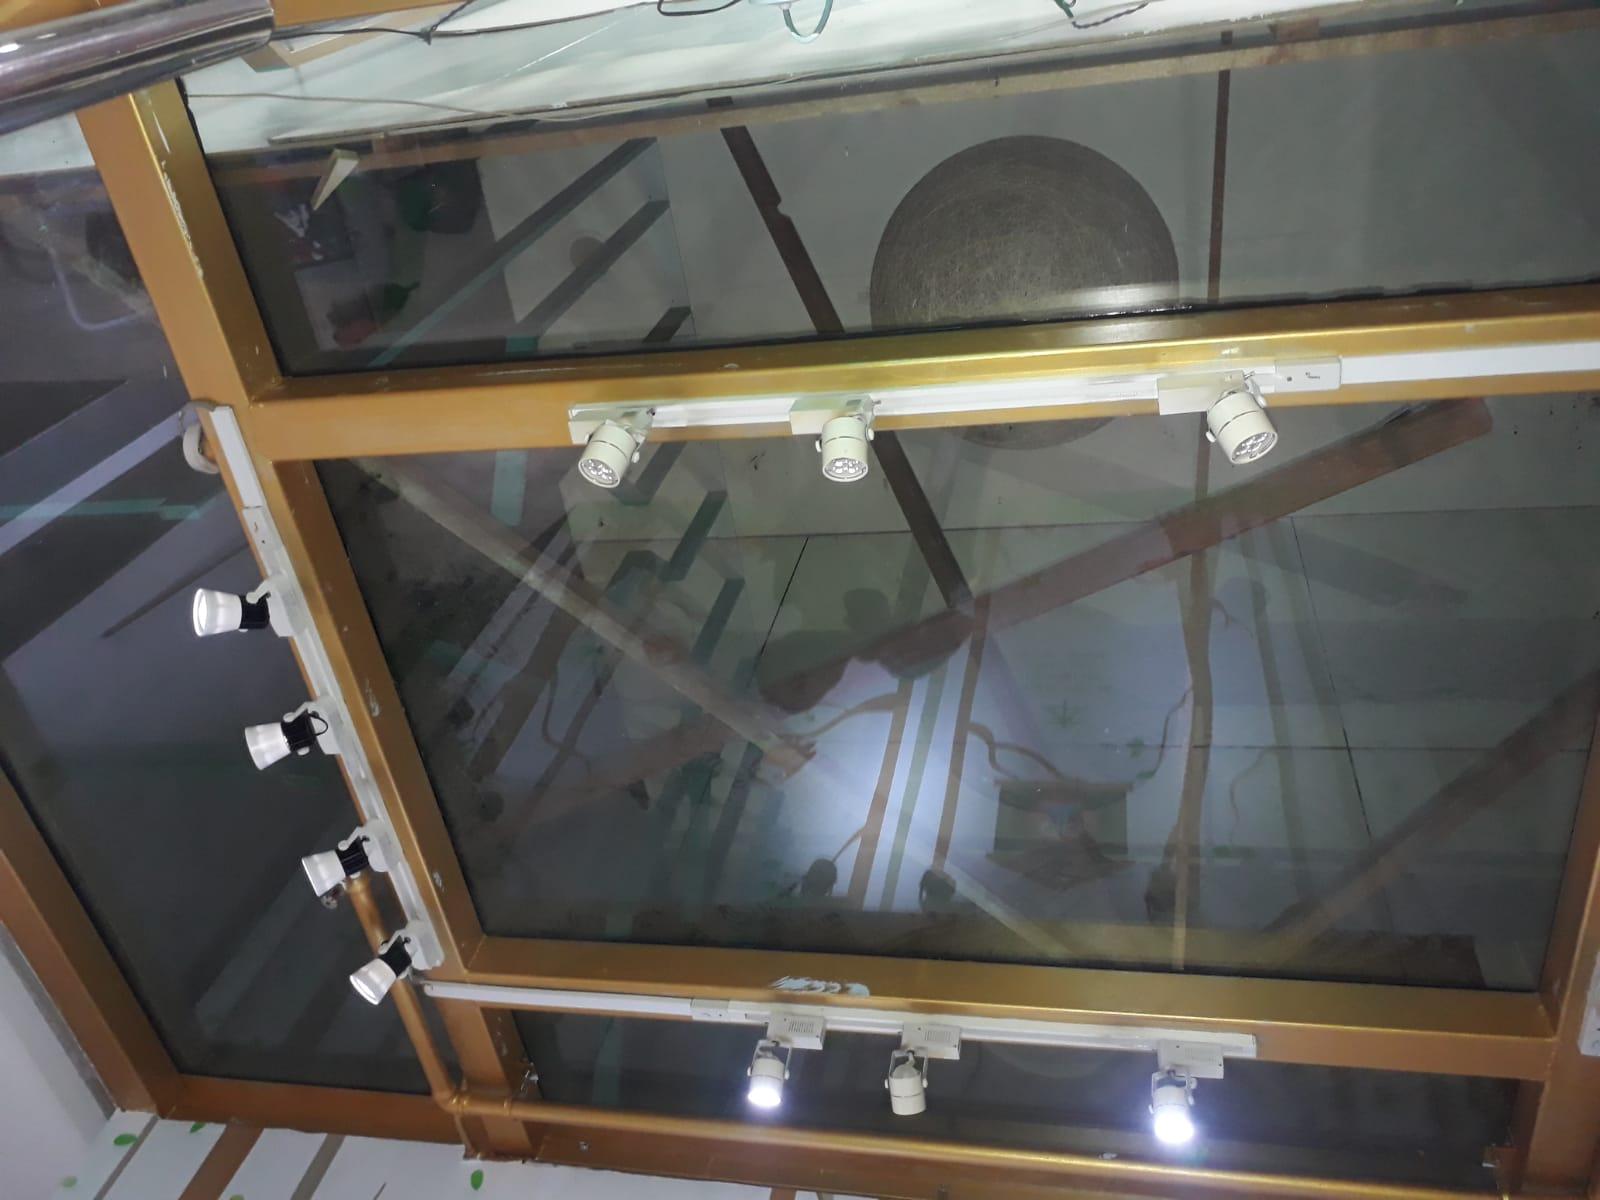 false-ceiling-installation-vm-ceiling-commercial-woodlands-singapore-3